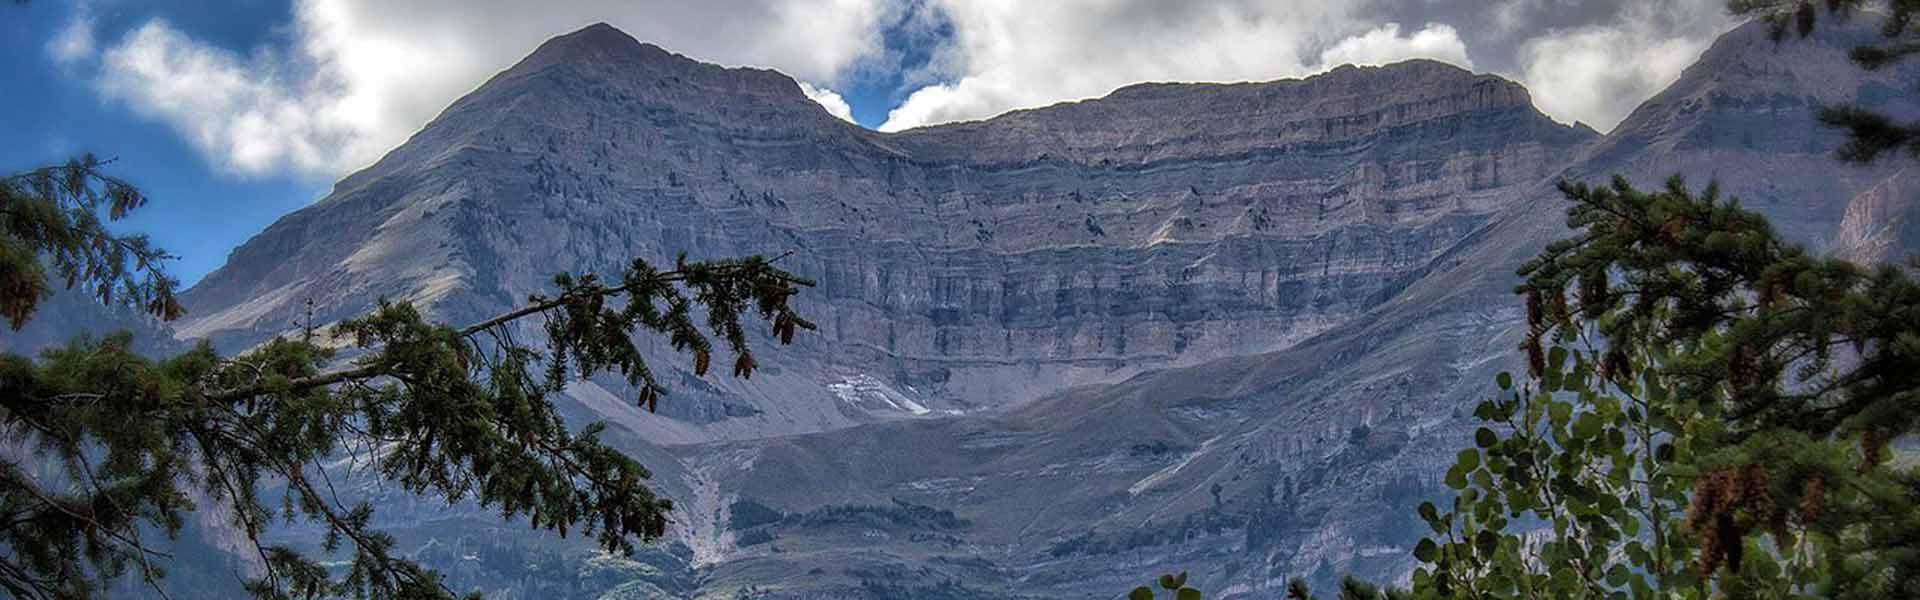 Timpanogos Mountain